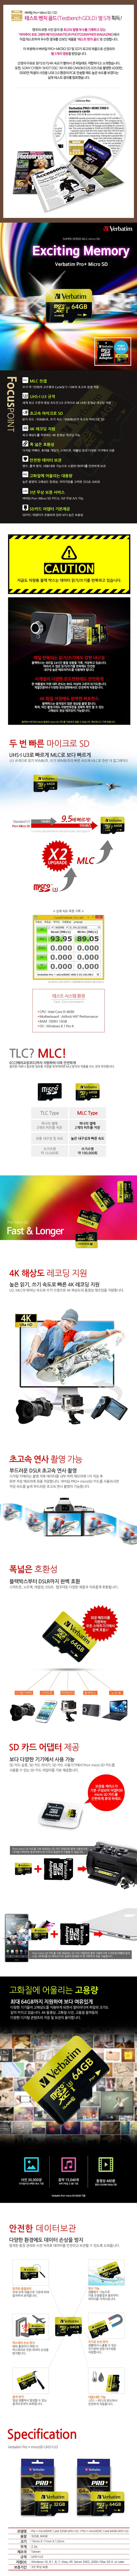 microSDHC 32GB CLASS10 Pro+ UHS-I U3 32G MLC 블랙박스 카메라 메모리카드 - 버바팀, 40,000원, SD/Micro SD/메모리카드, Micro SD카드